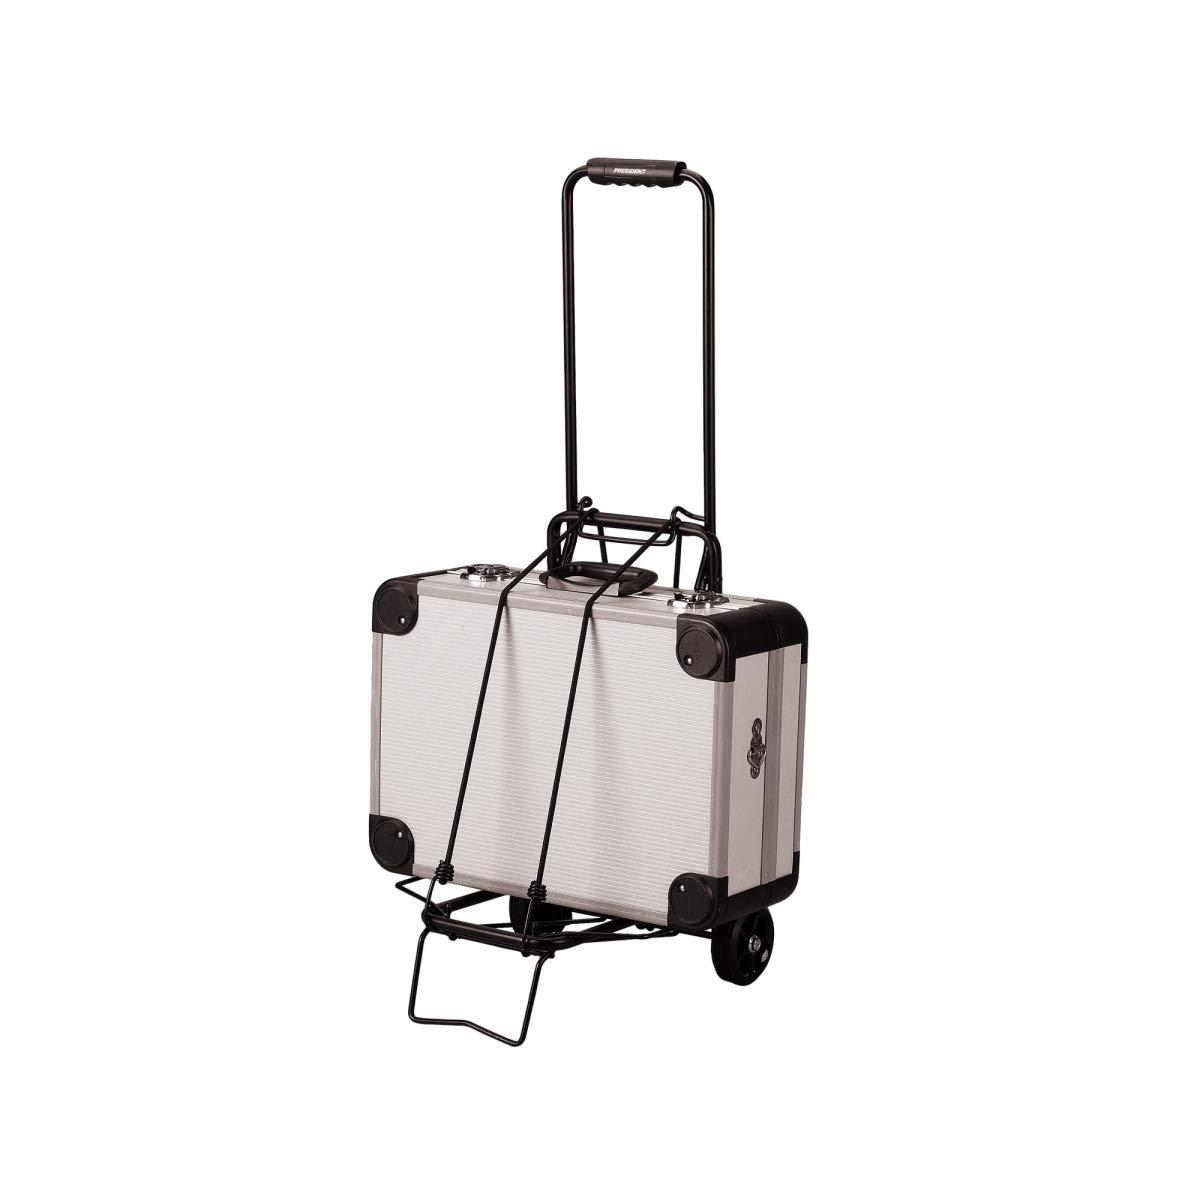 Brandobay Portable Folding Luggage Cart - Trolley Shopping Travel Compact Hand Carrier Bag - Folding Hand Truck by Brandobay